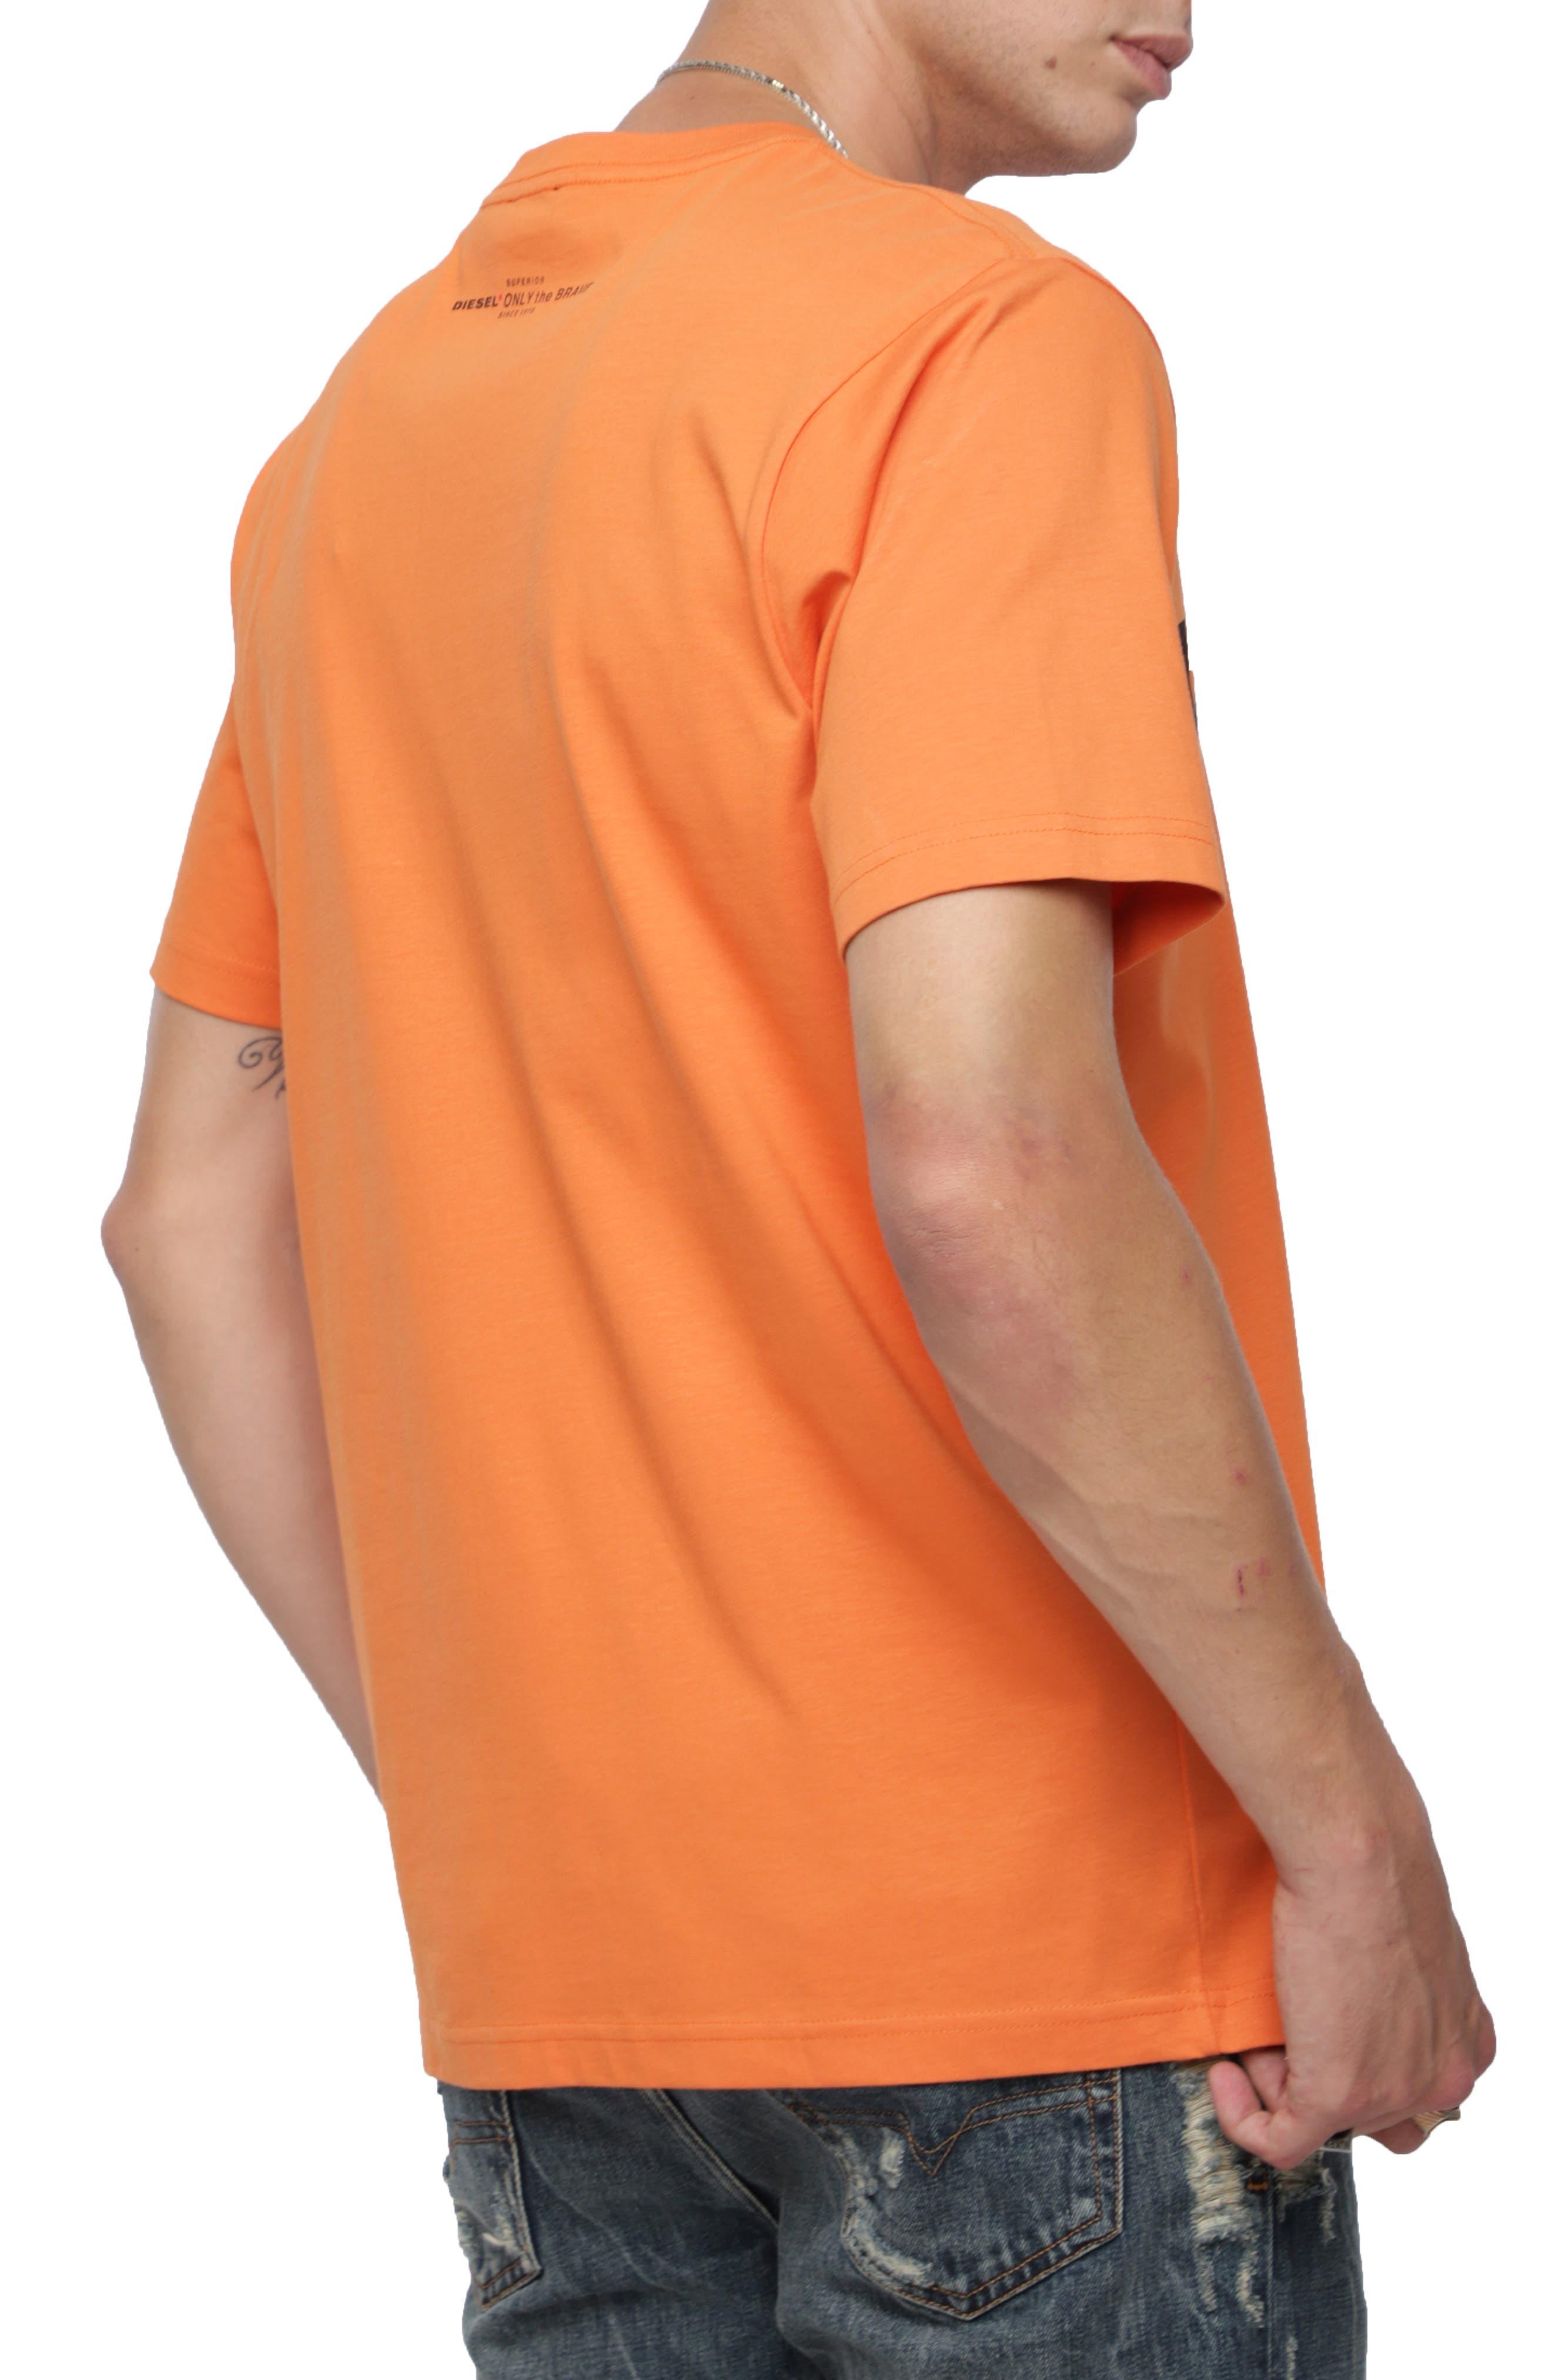 T-JUST-X1 Short Sleeve T-shirt,                             Alternate thumbnail 2, color,                             815